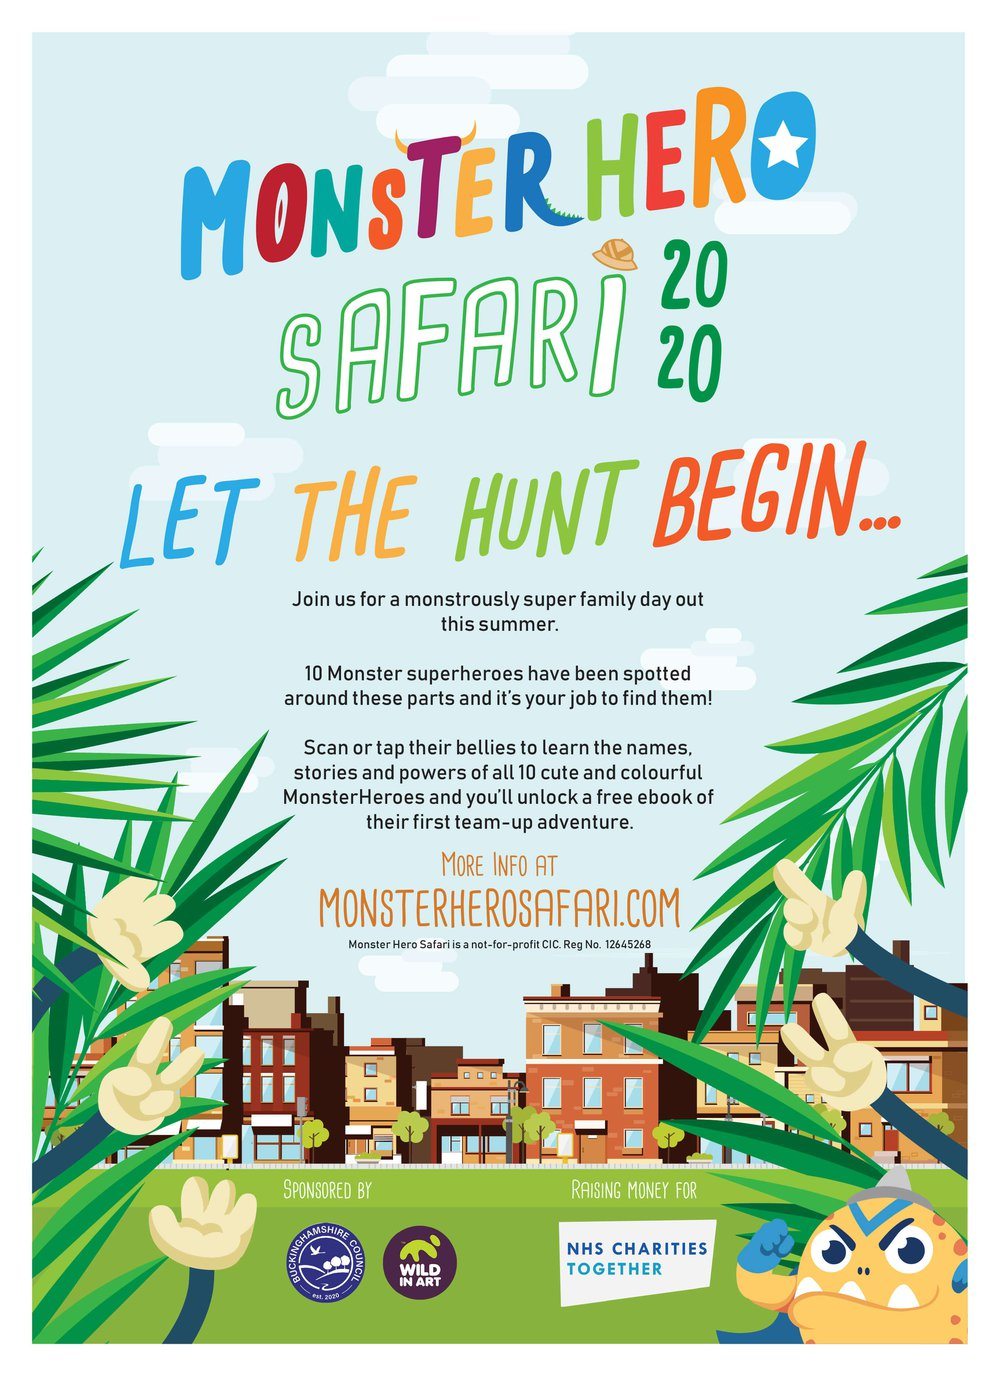 MonsterHero A4 Poster